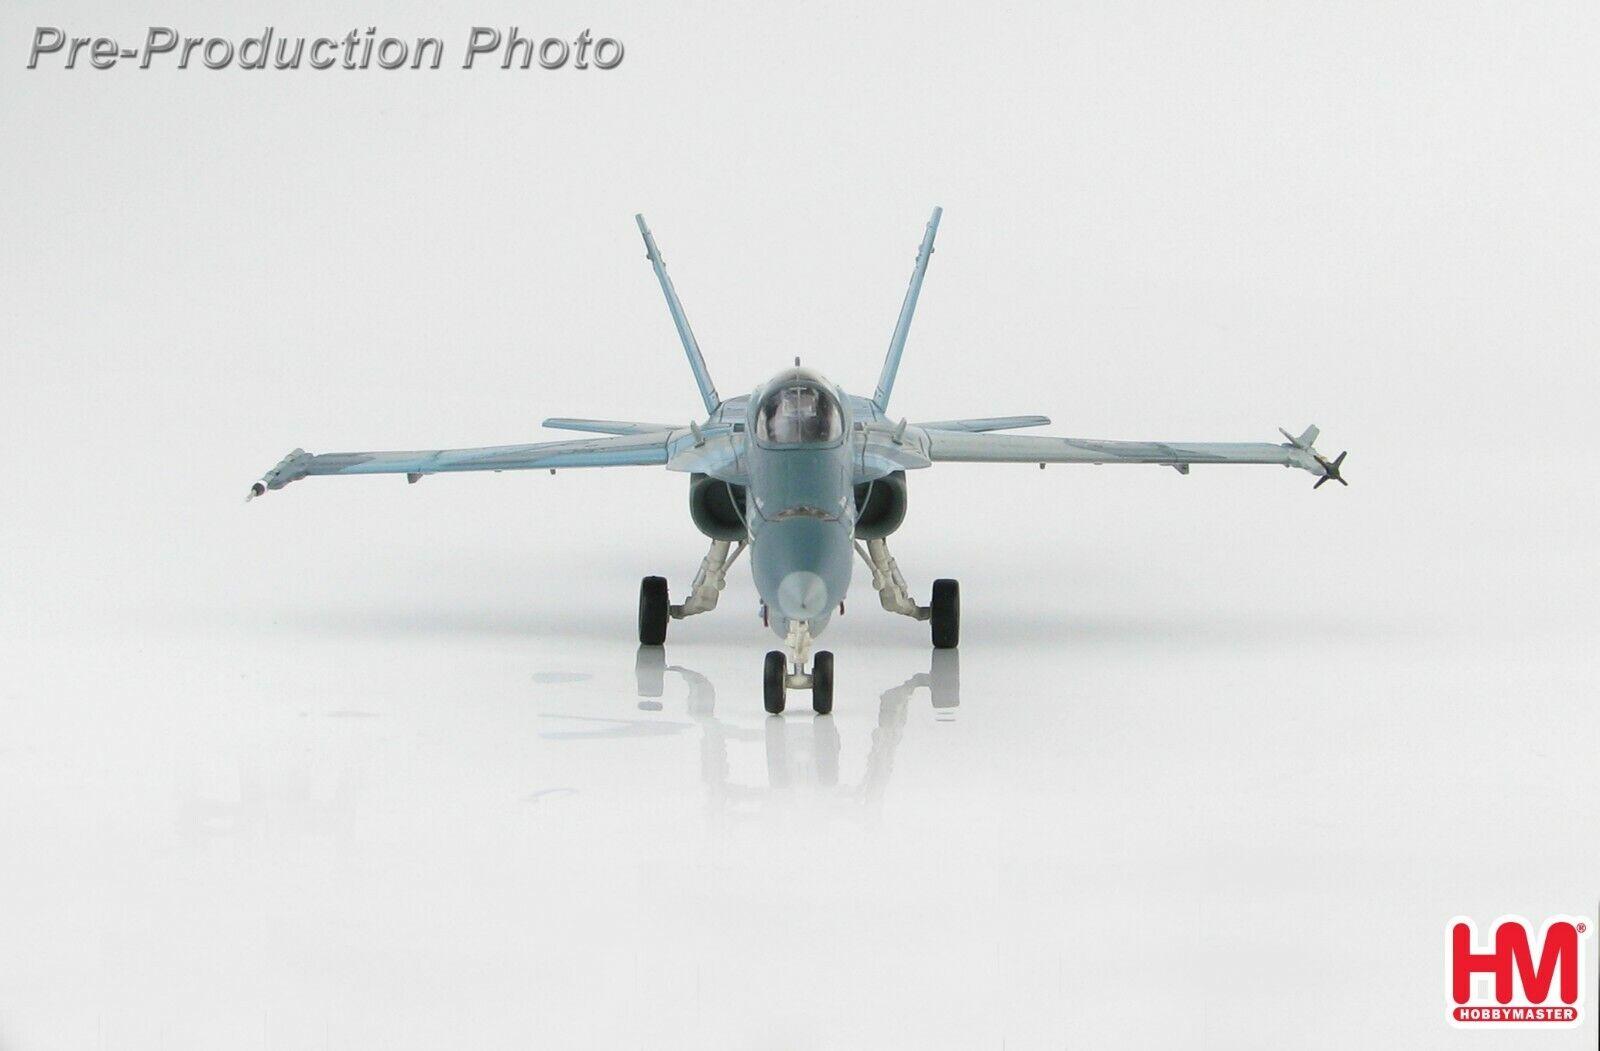 Hobby Master HA3544, McDonnell Douglas F A-18A Buno 162875, NSAWC 55, 2004-2006